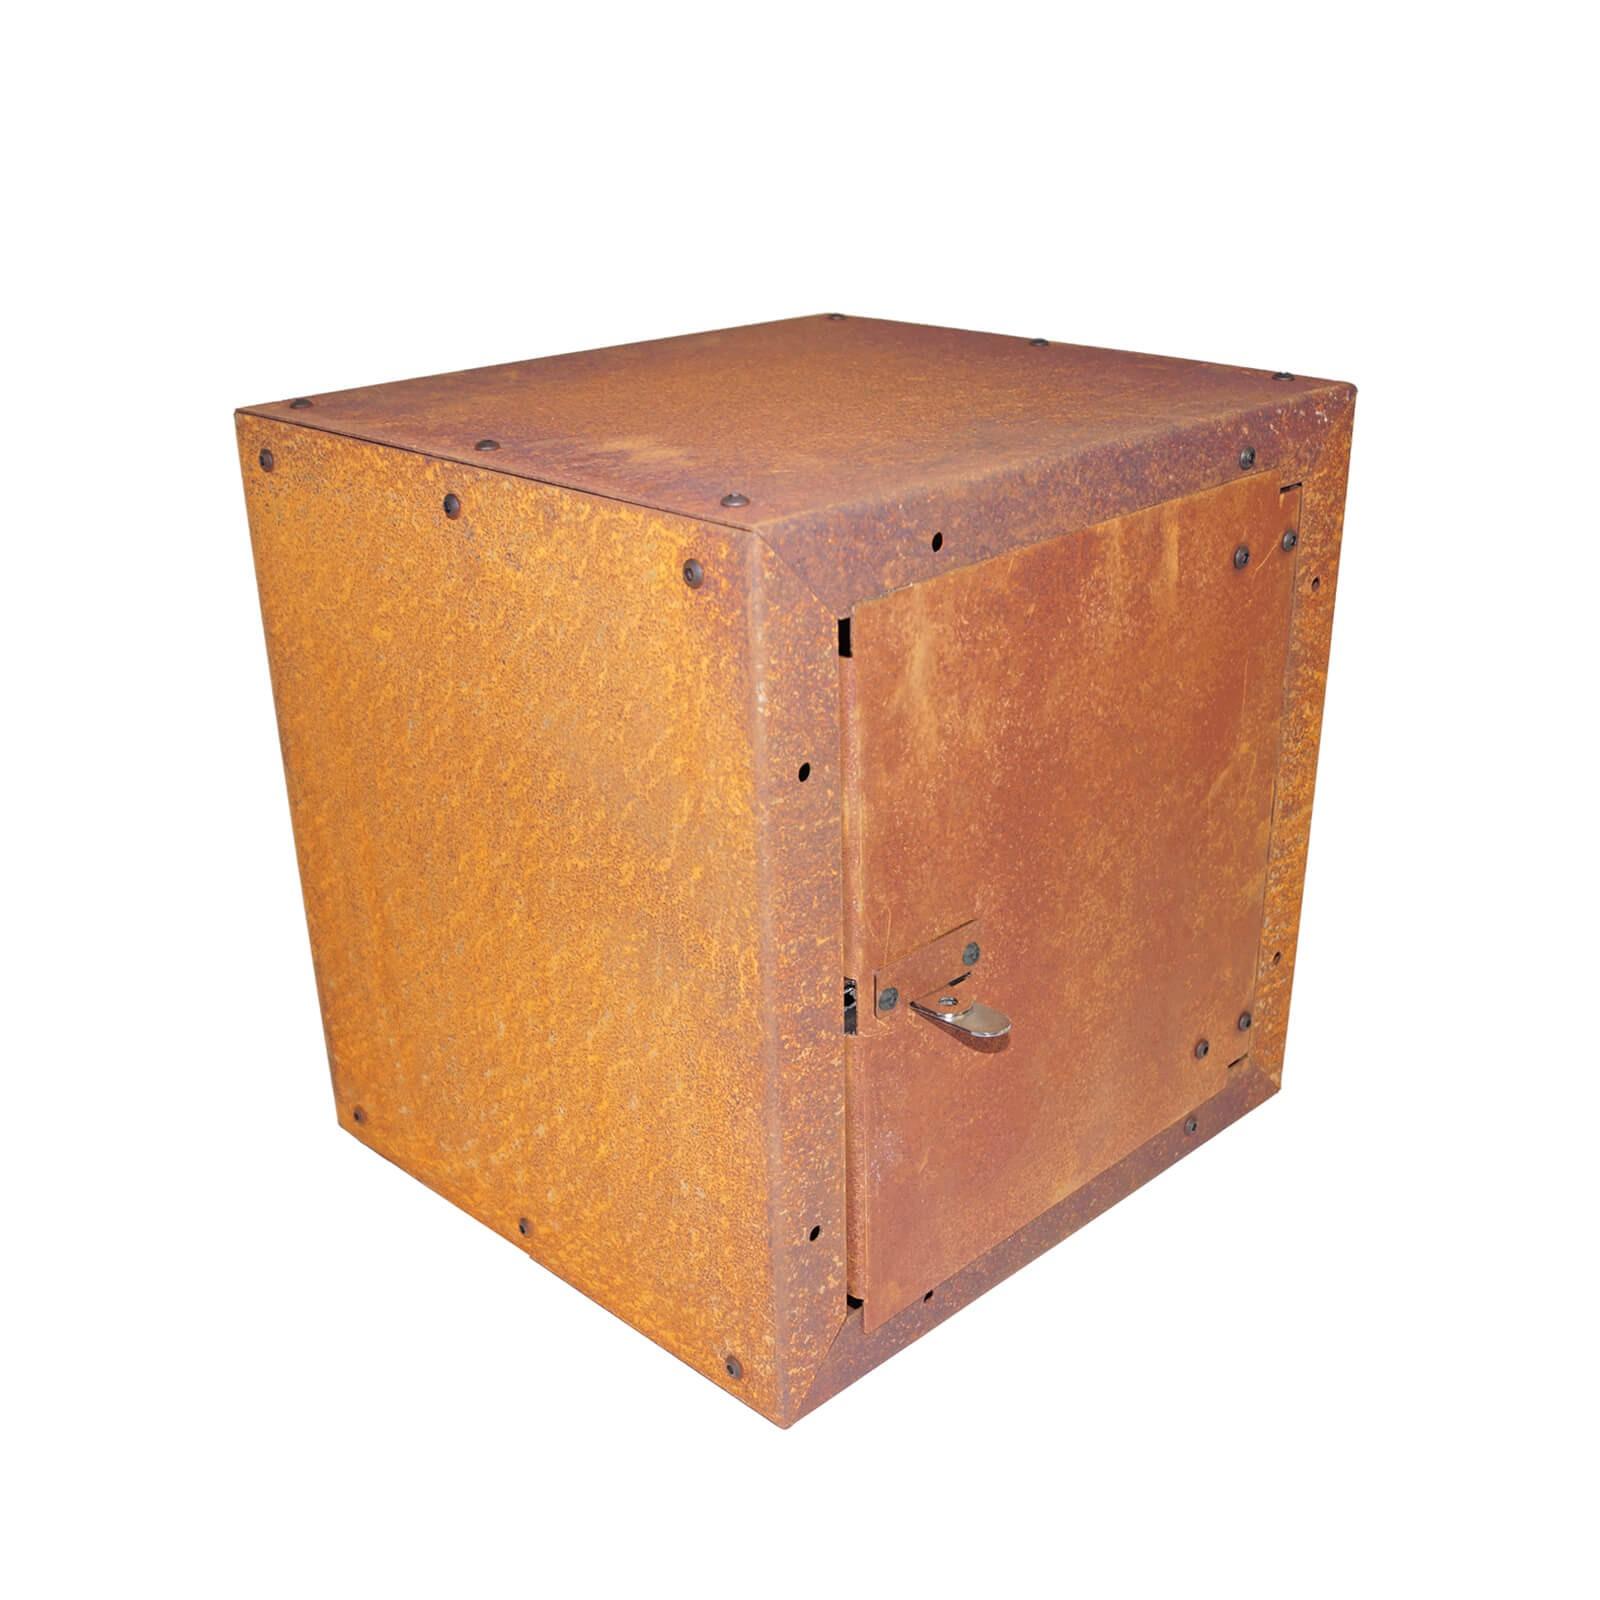 prima terra schrank gartenschrank edelrost infinita 38x38x35 cm ger teschrank ebay. Black Bedroom Furniture Sets. Home Design Ideas